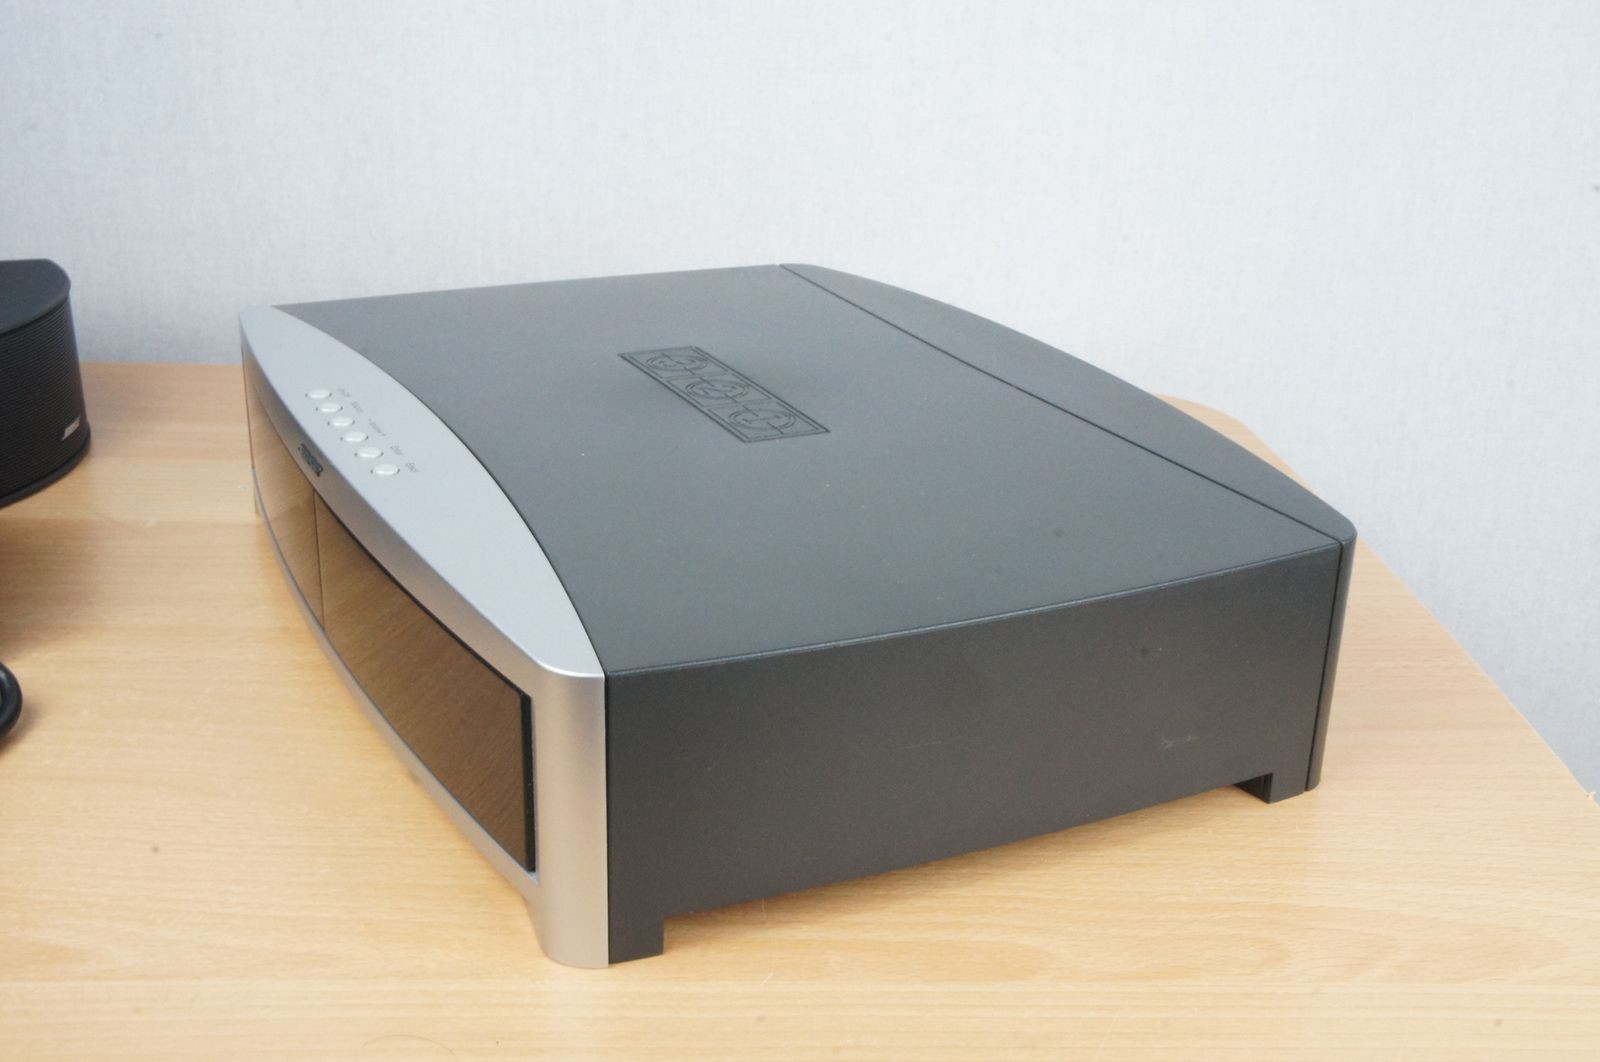 bose 321 3 2 1 gs series iii heimkino system mit hdmi ebay. Black Bedroom Furniture Sets. Home Design Ideas